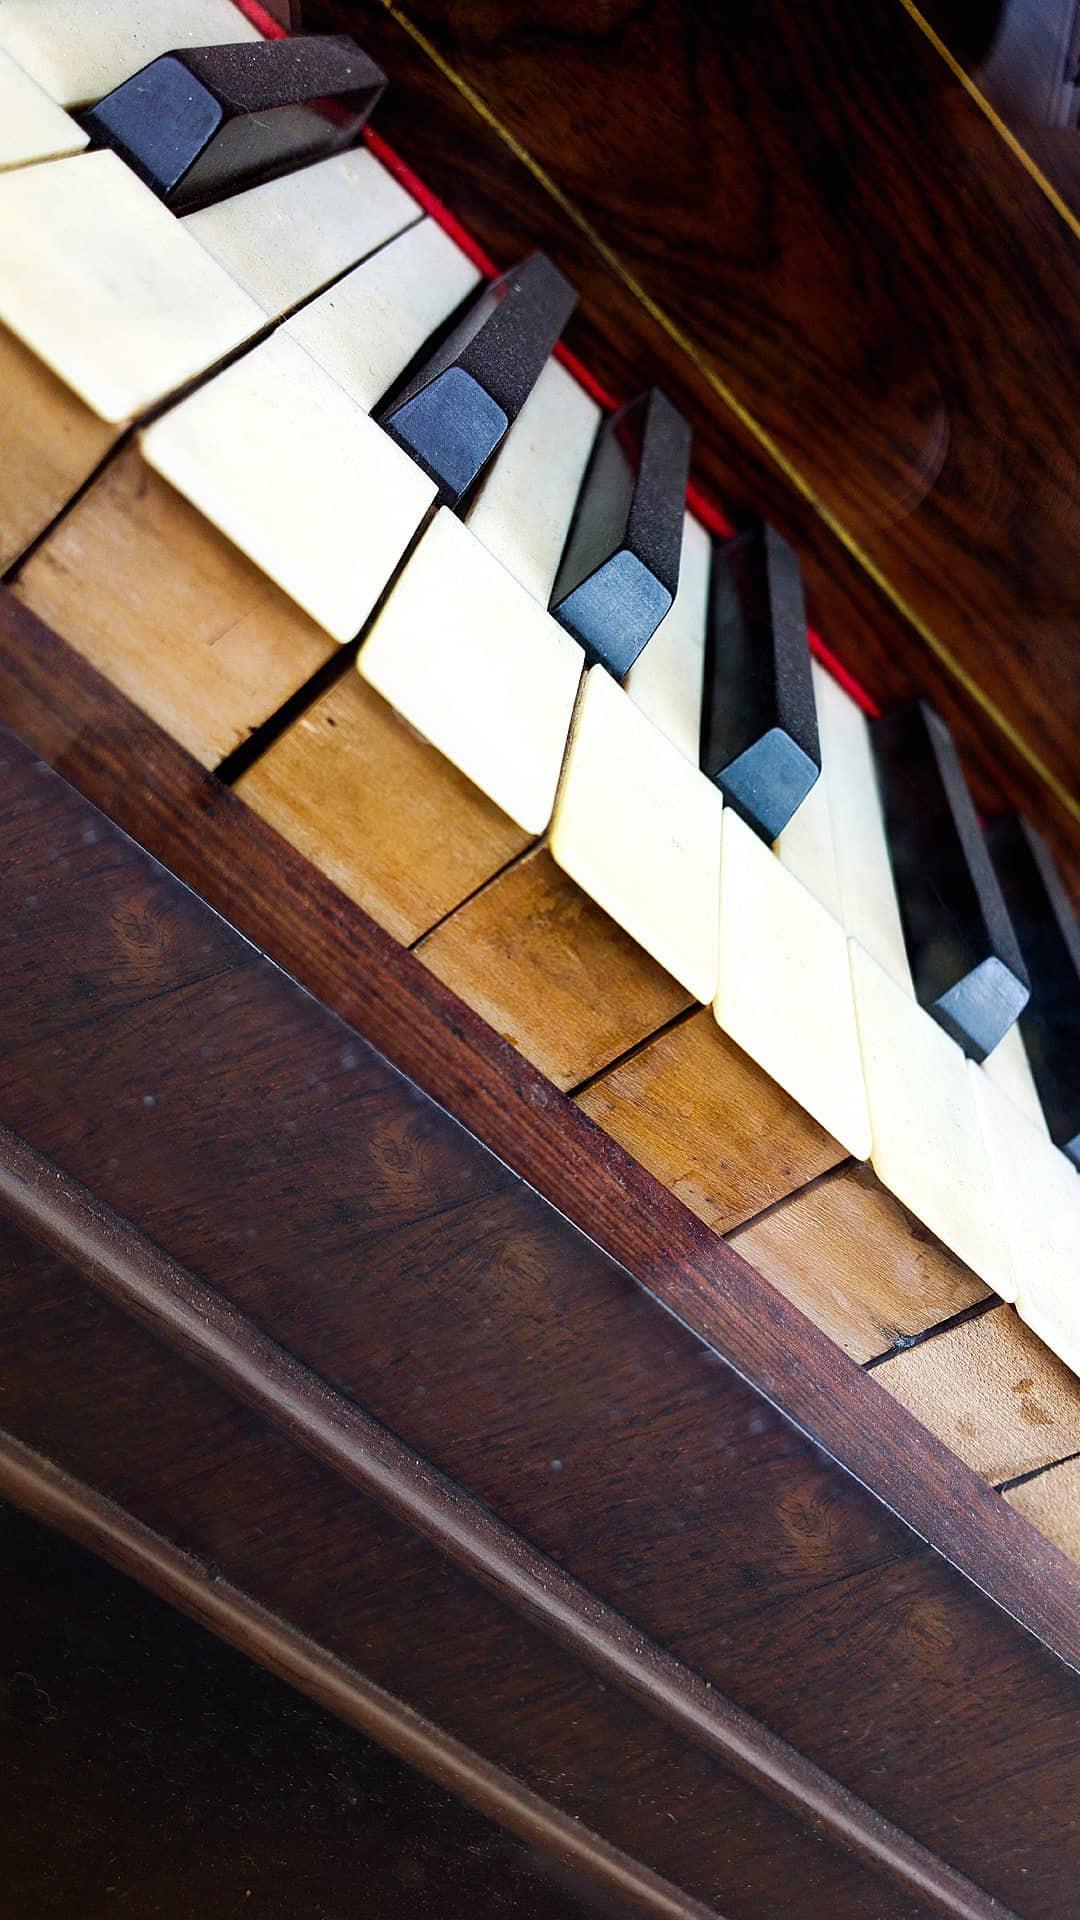 Old Piano Keys Android Wallpaper